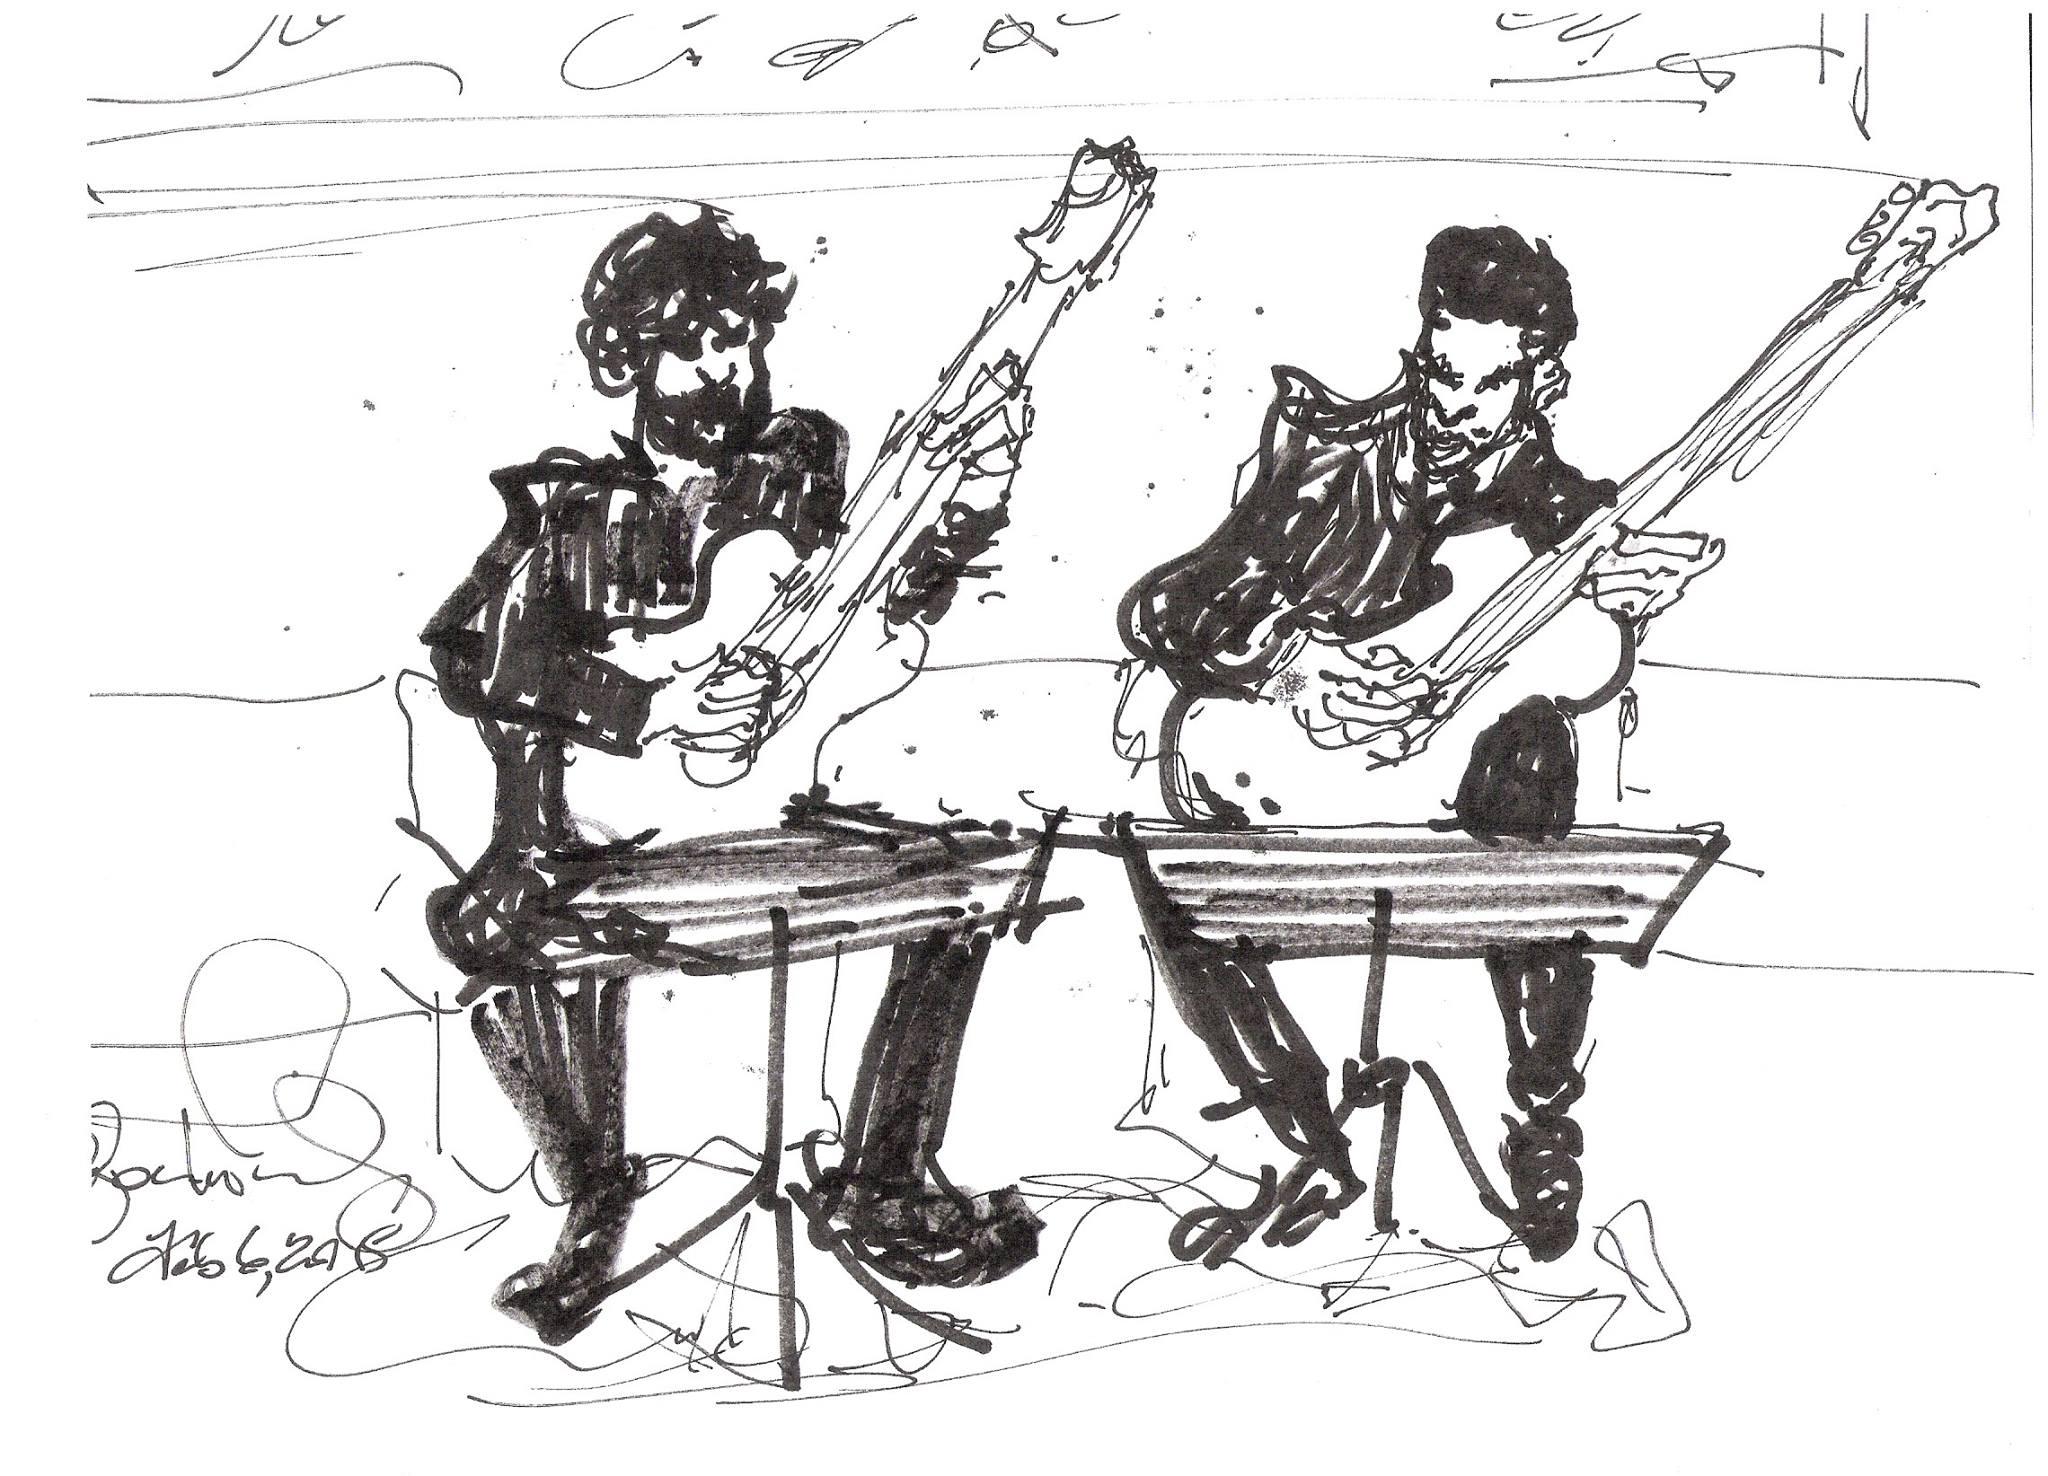 Solomon Thurman Artist Sketch